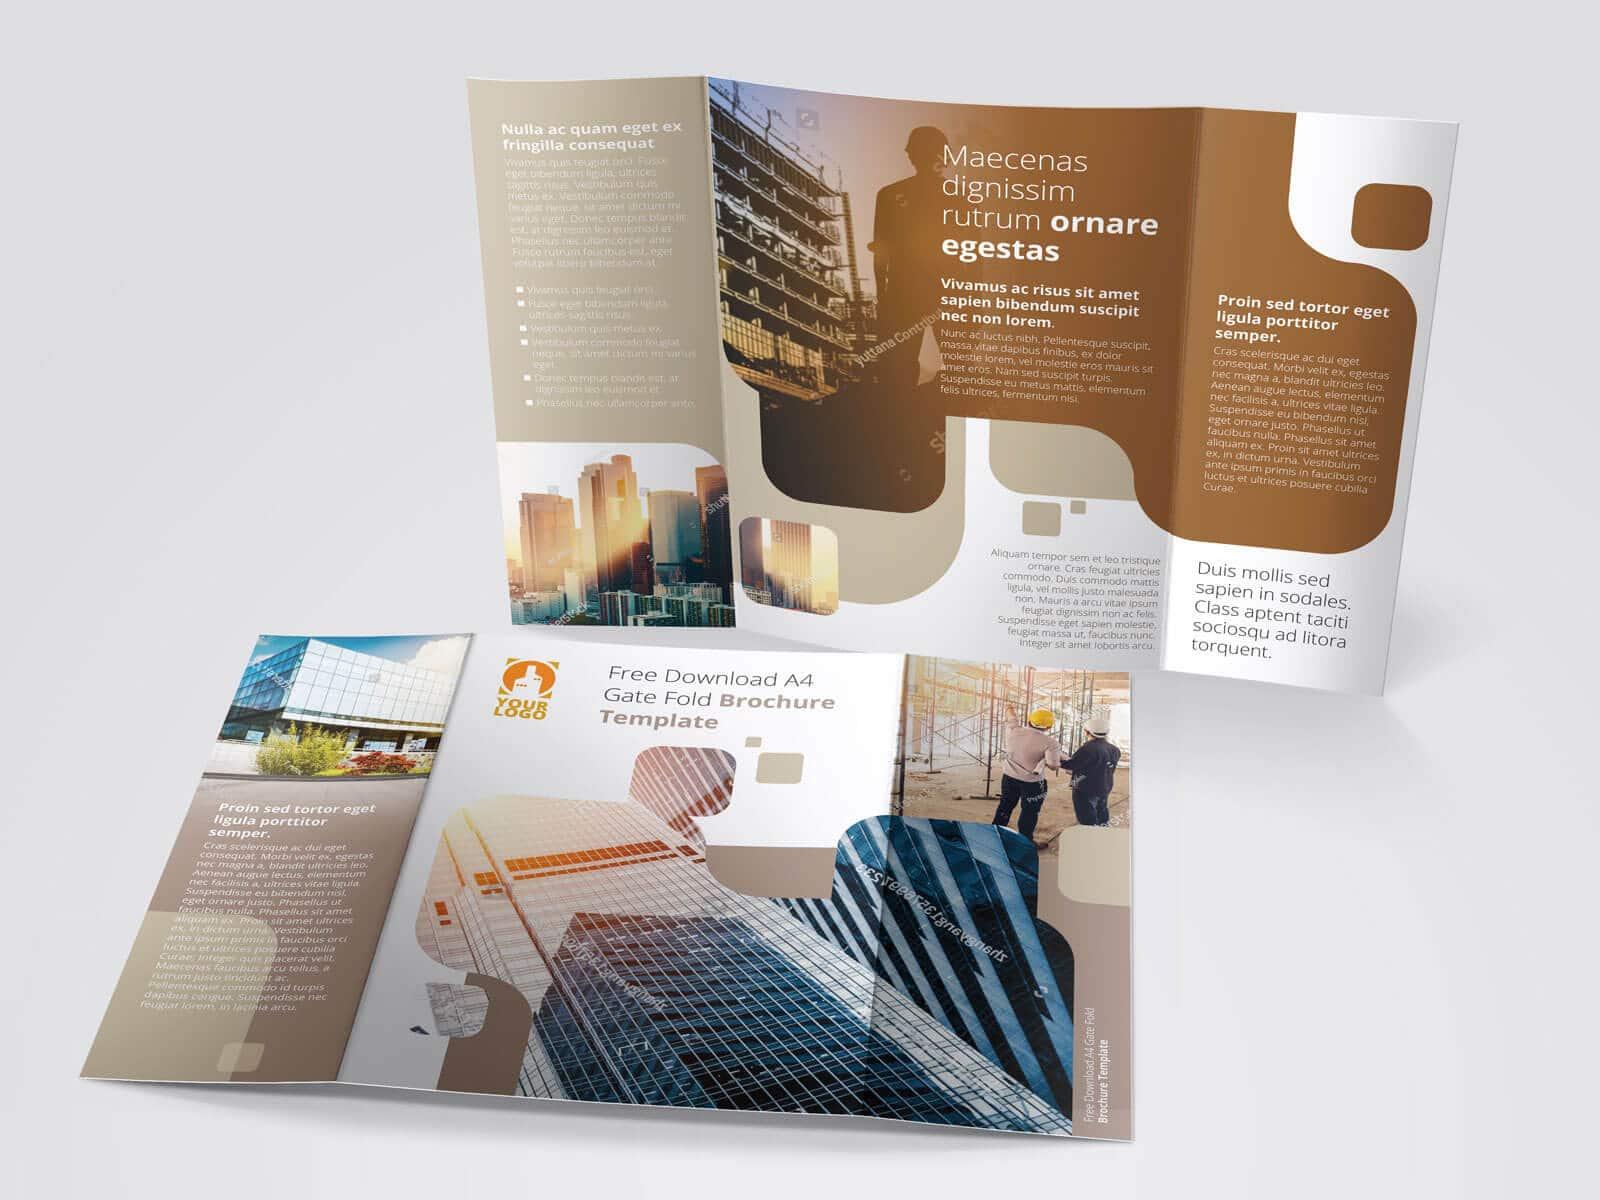 17 x 11 Gate Fold Brochure Mockup 03